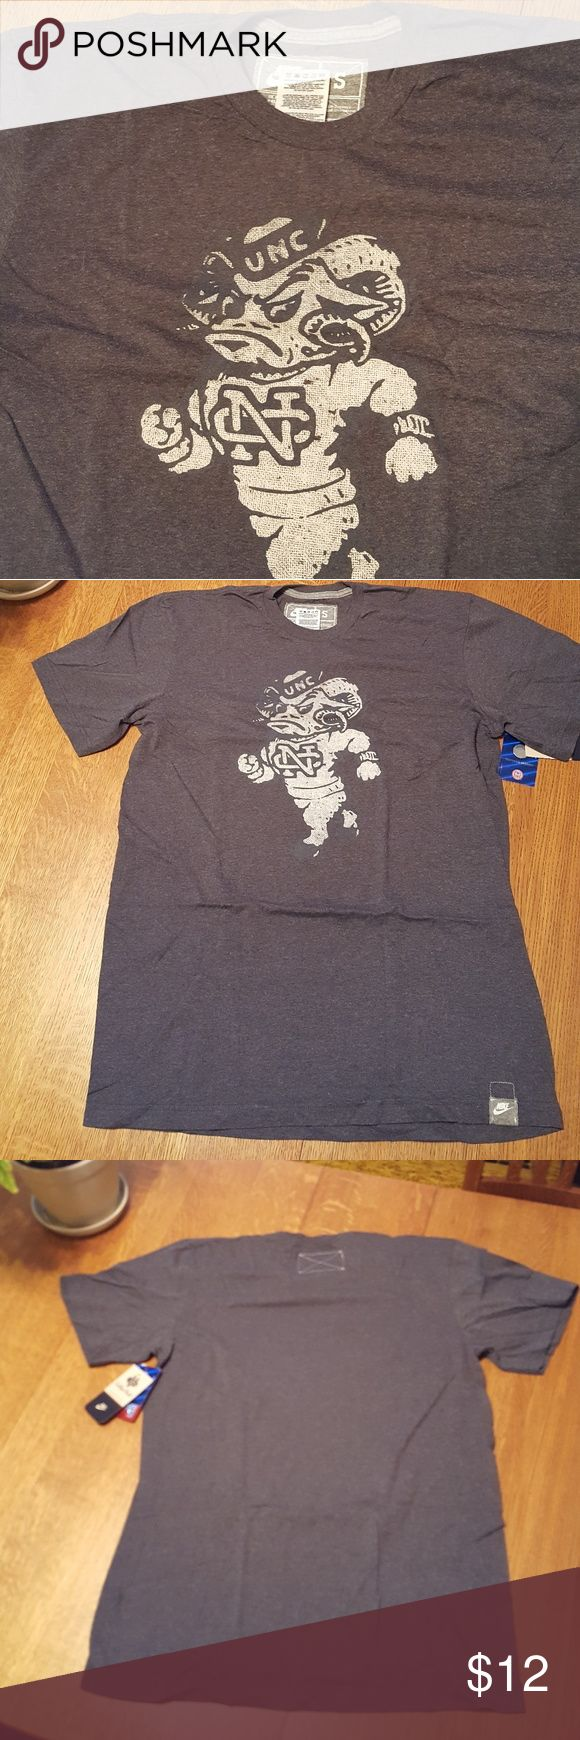 Nike University of North Carolina t-shirt NWT NIKE UNC logo tee in heathered grey Nike Shirts Tees - Short Sleeve